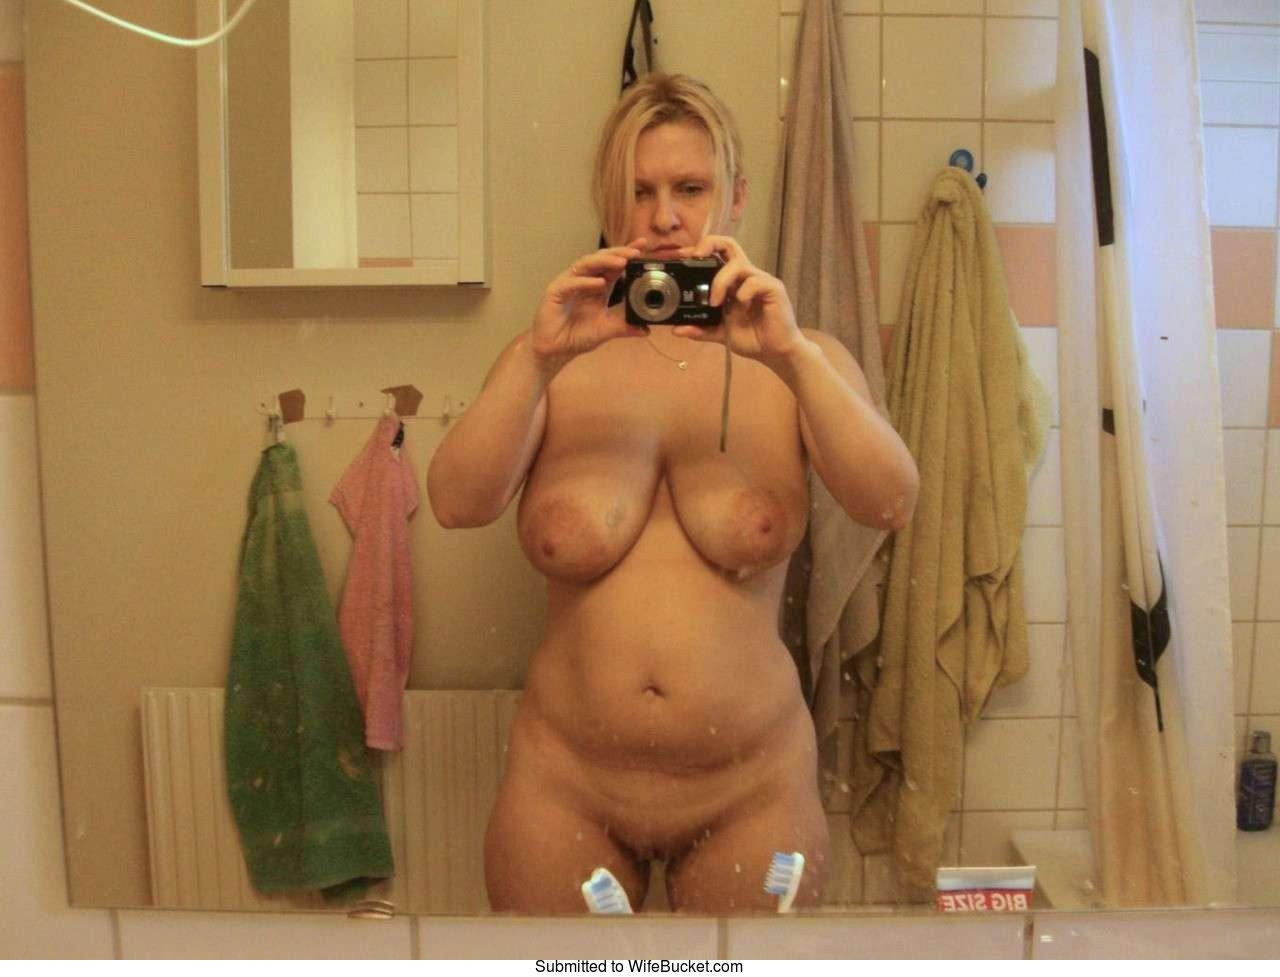 Mature naked selfie girl hot mirror nude